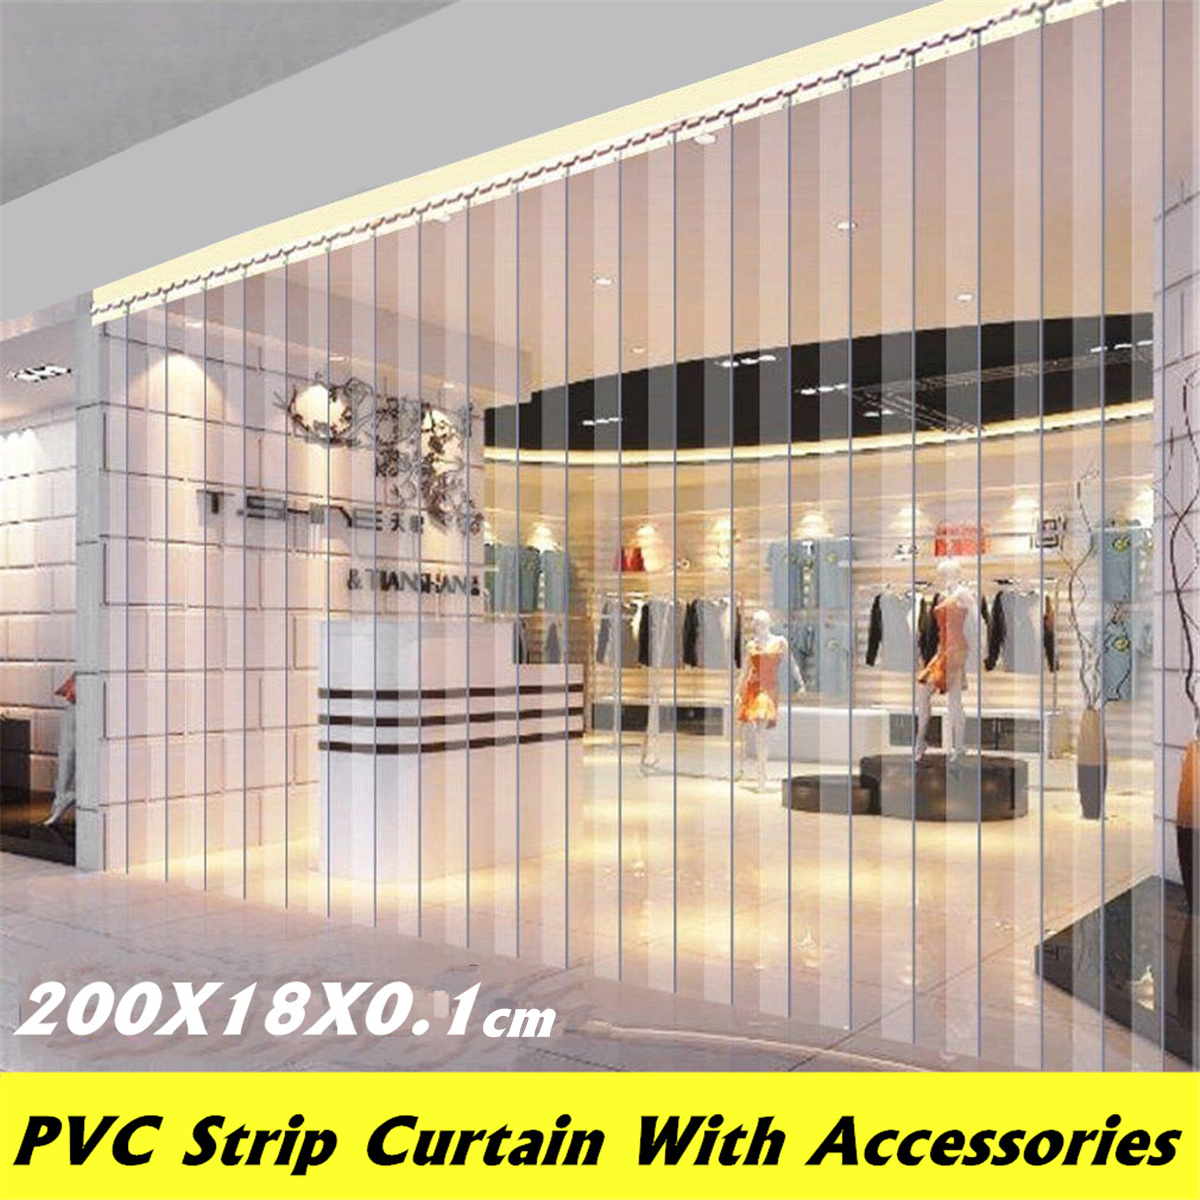 PVC Plastic Strip Curtain Freezer Room Door Strip Kit Hanging Rail Transparent Curtains Windproof Heat Cold Resist 200*18*0.1cm